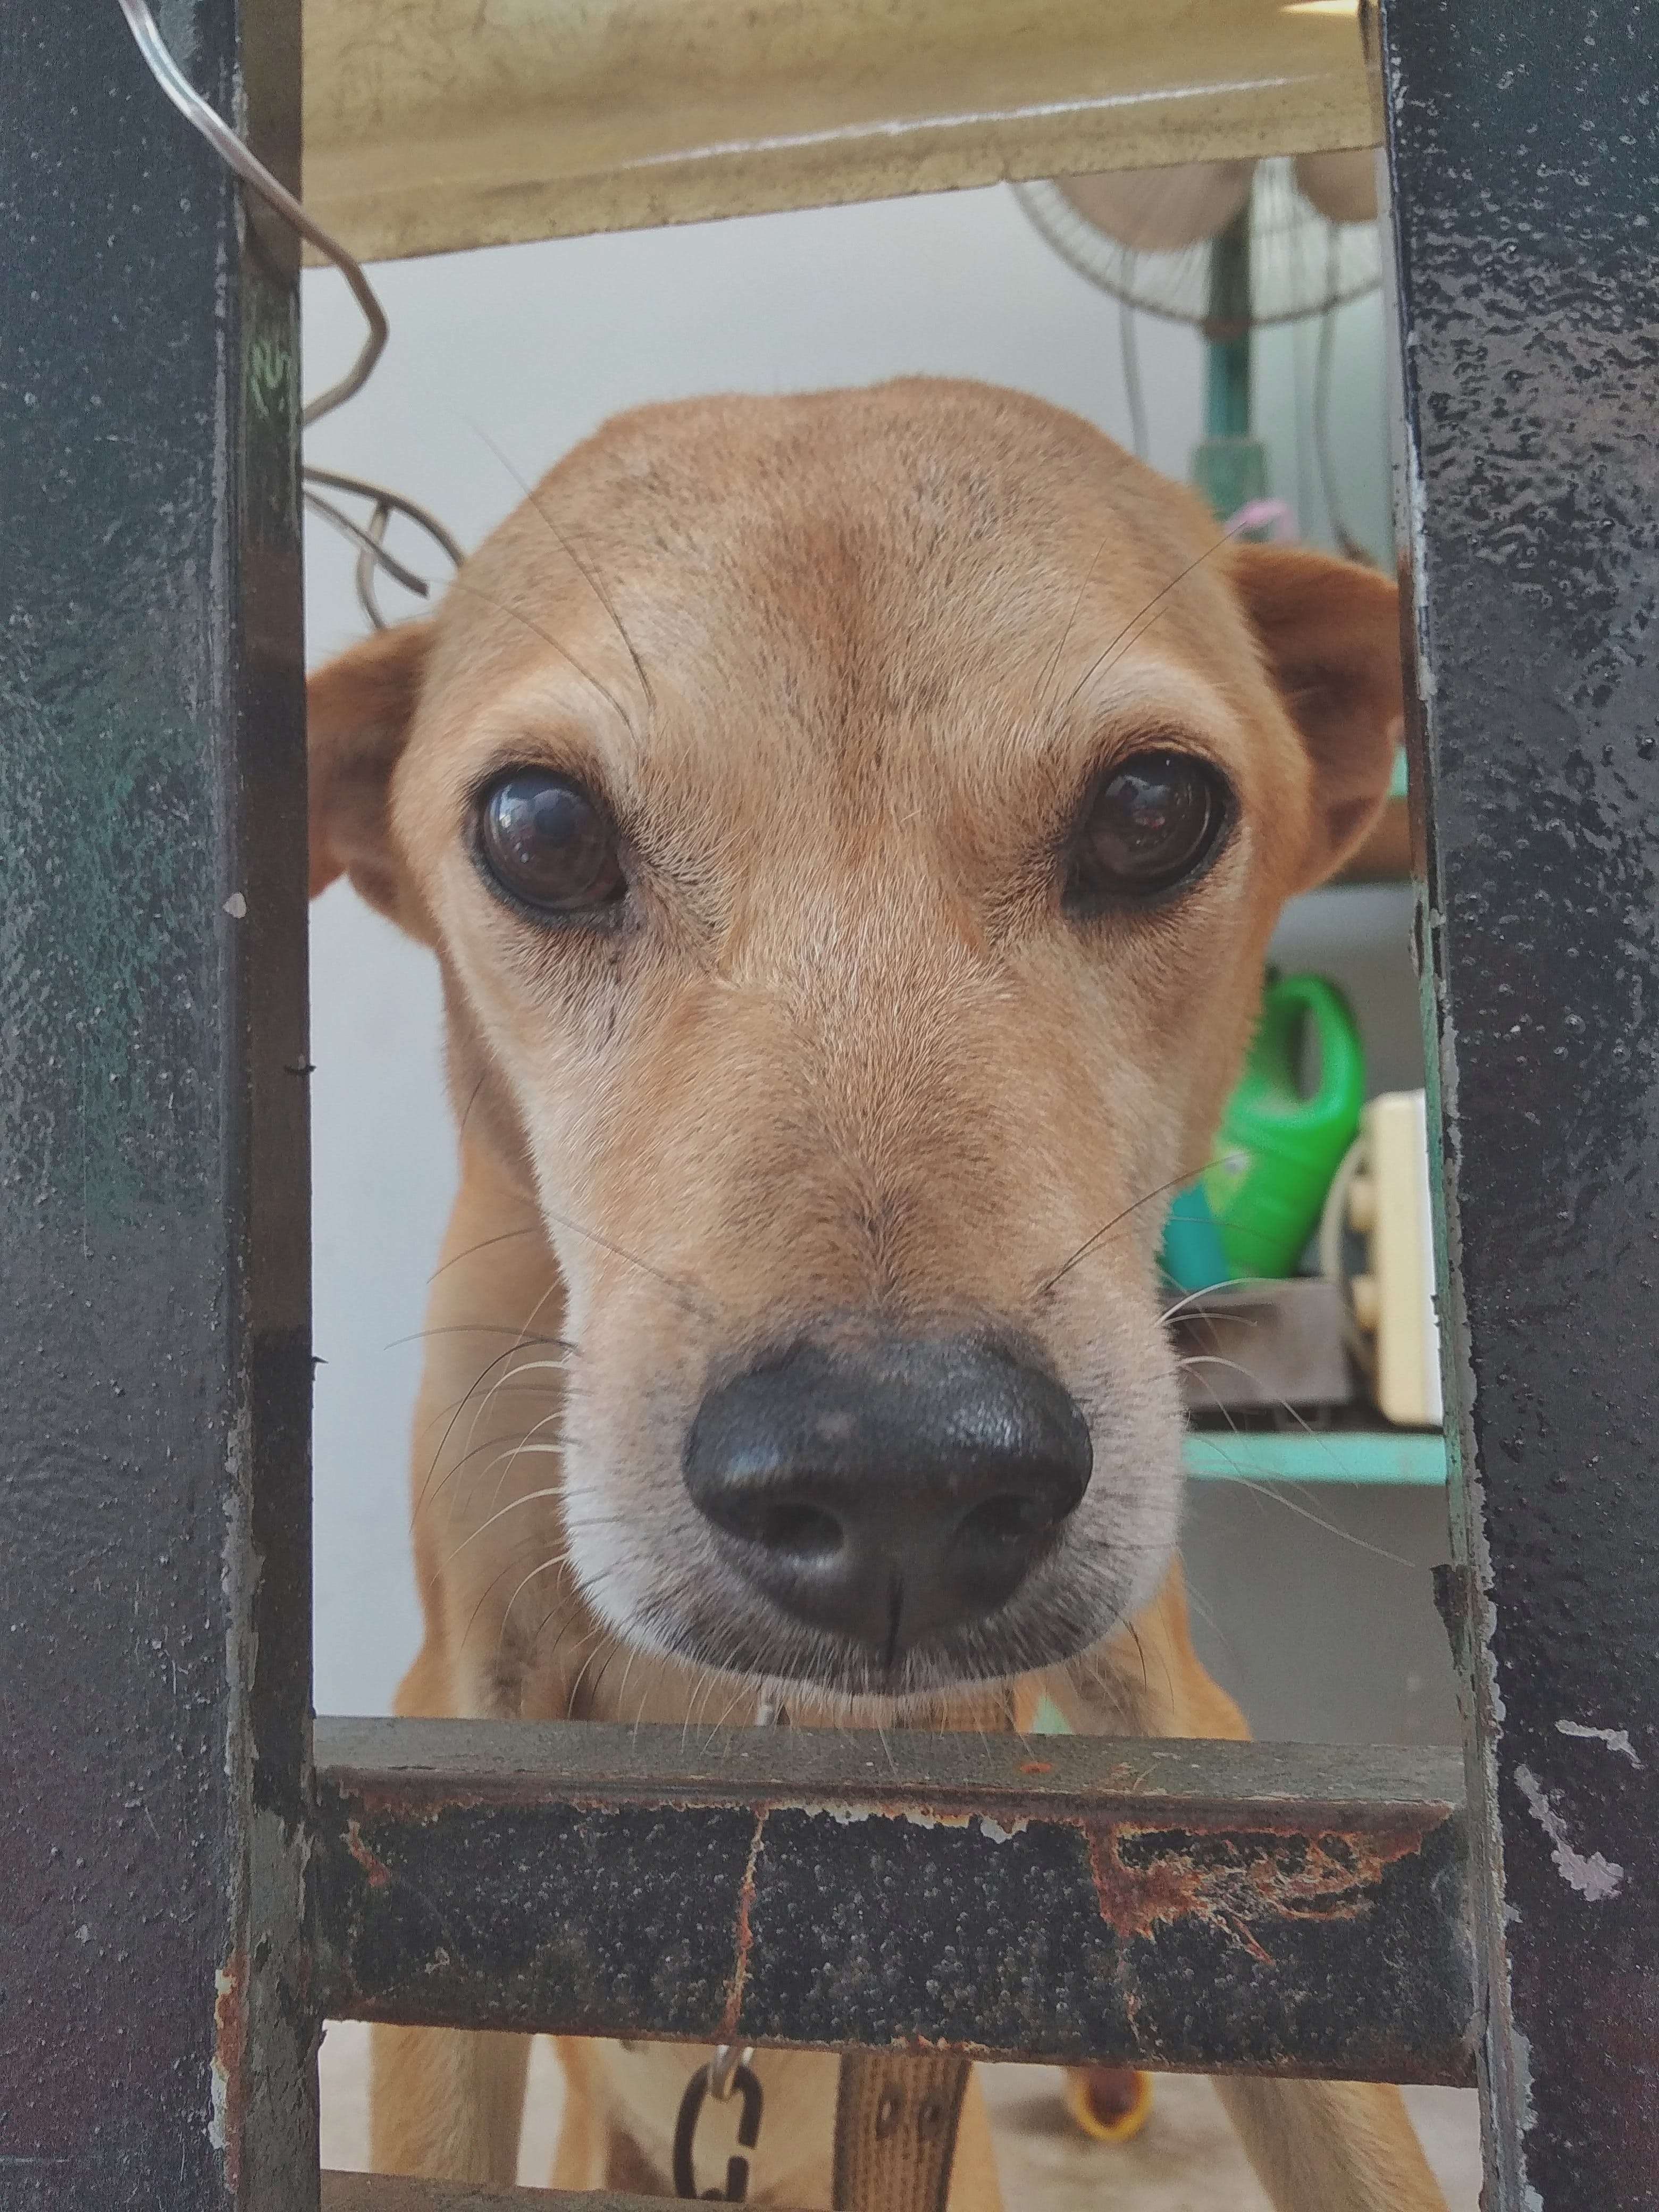 Free stock photo of #dog, animal, Hello